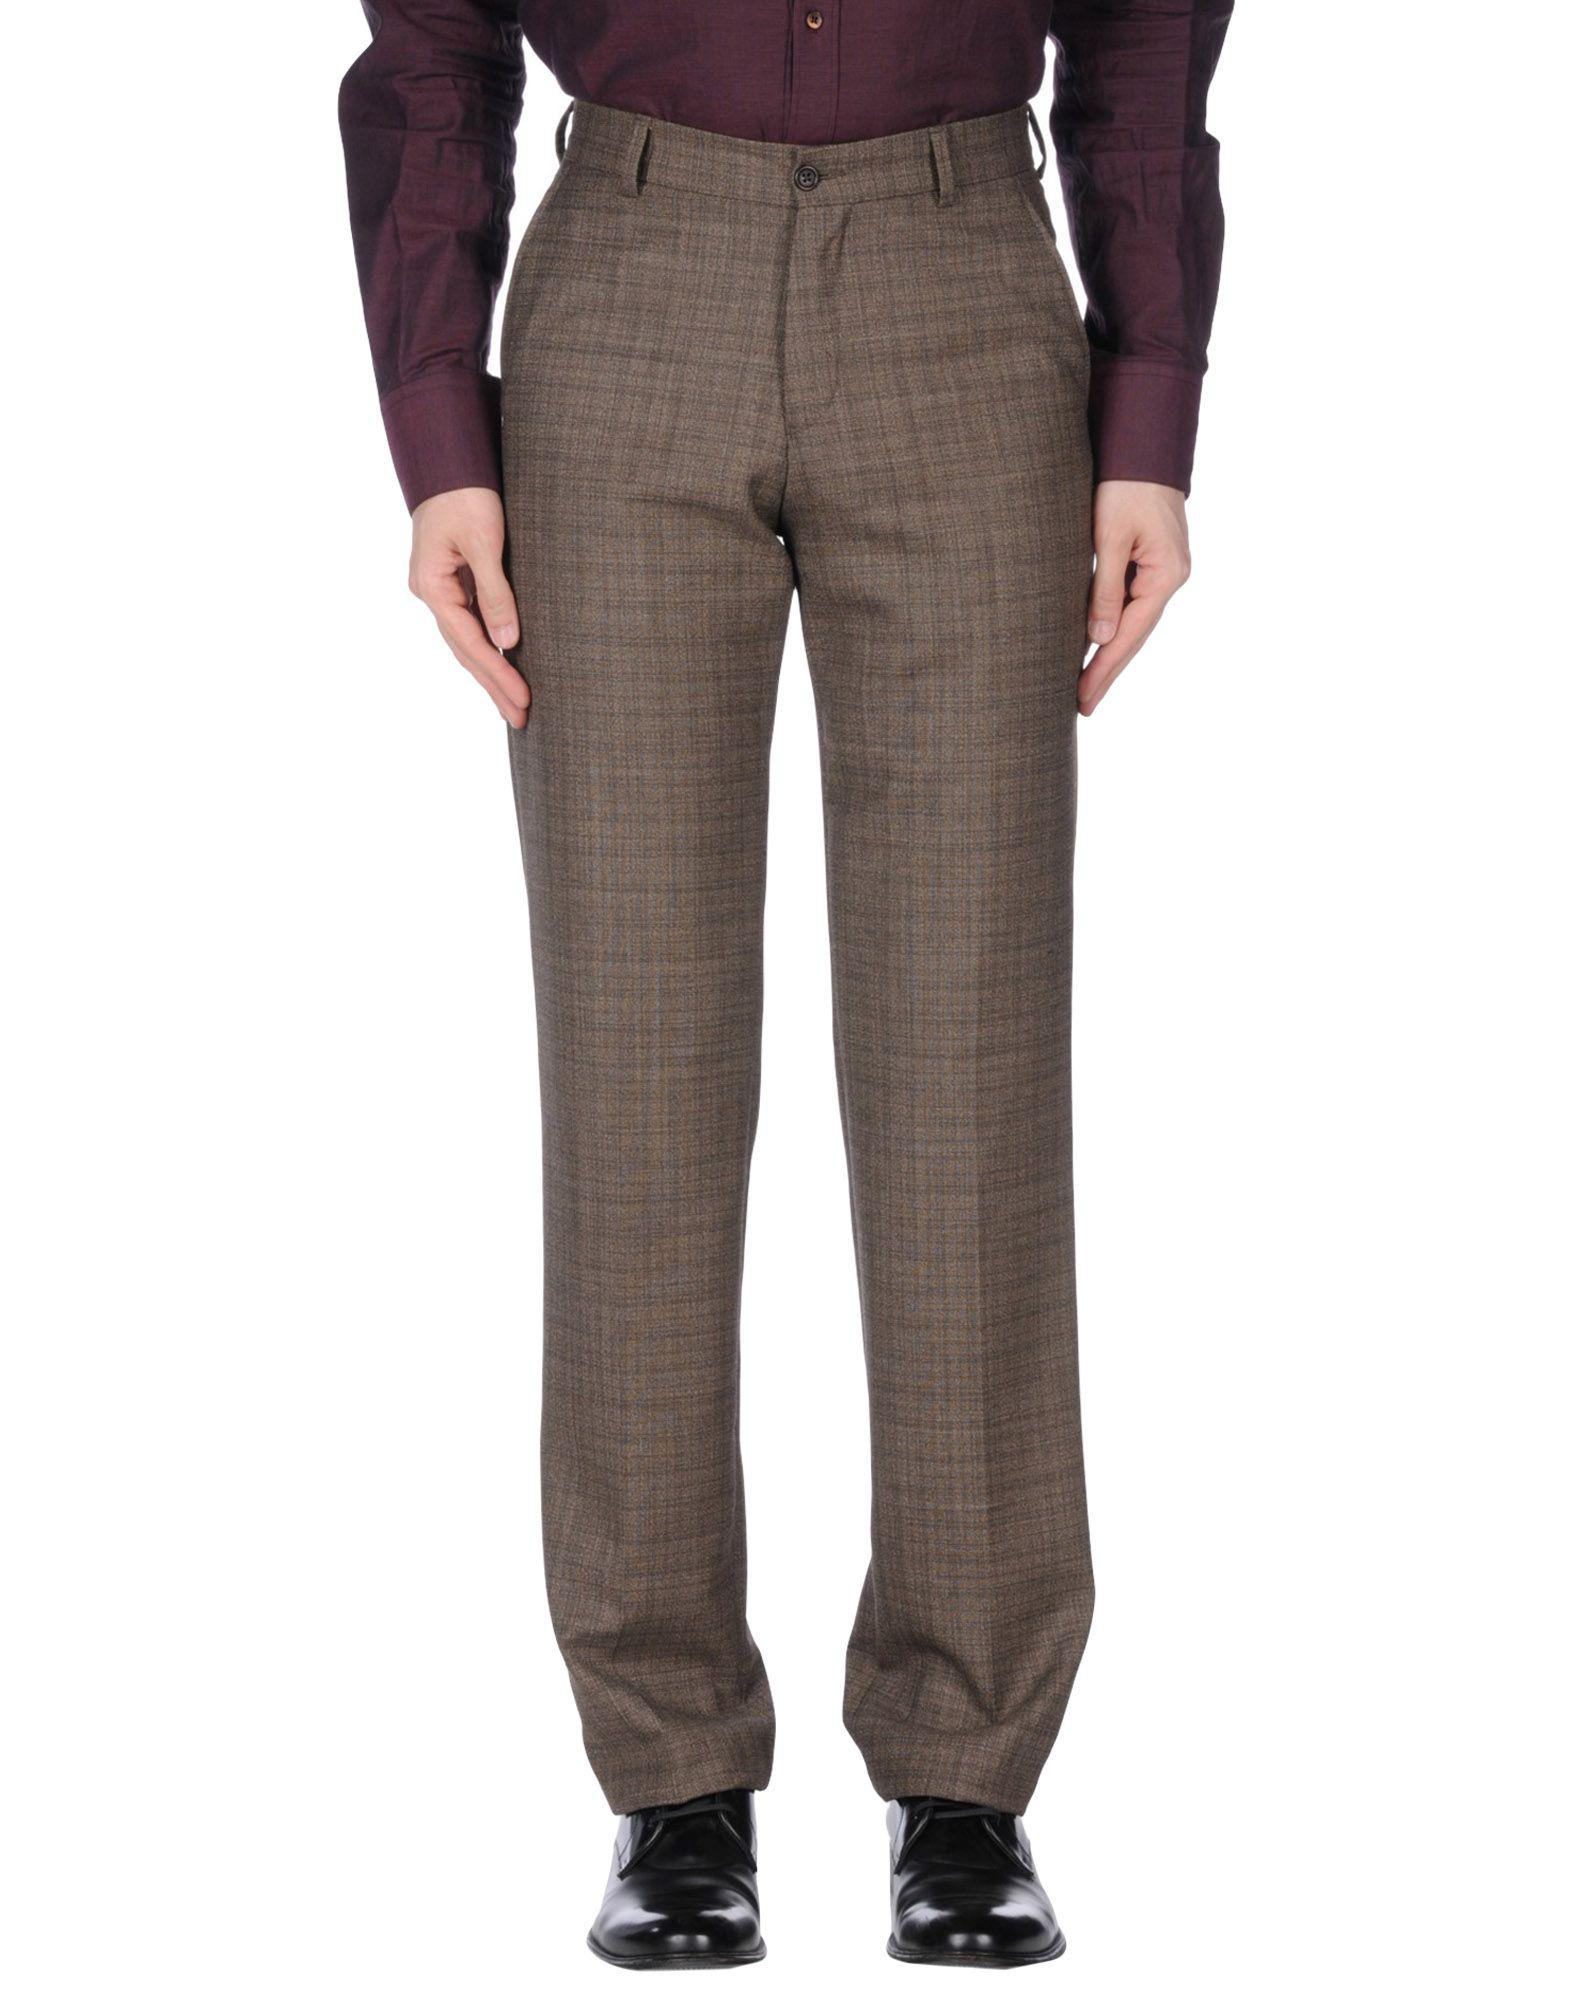 TROUSERS - Casual trousers HOLLAND ESQUIRE Cheap Finishline bZgoSAi